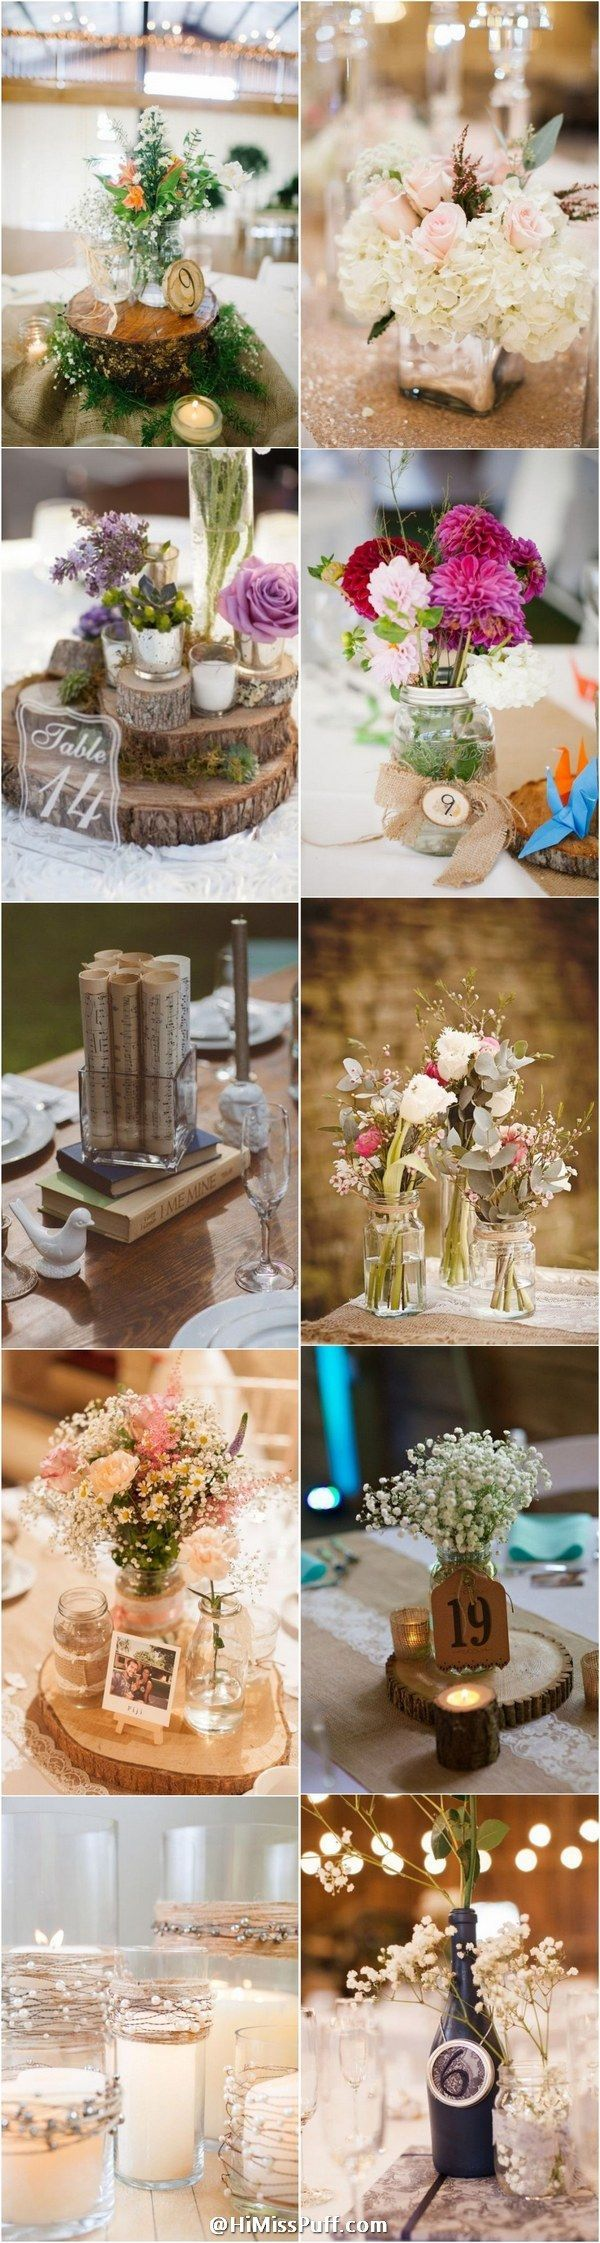 country rustic wedding centerpiece ideas country wedding